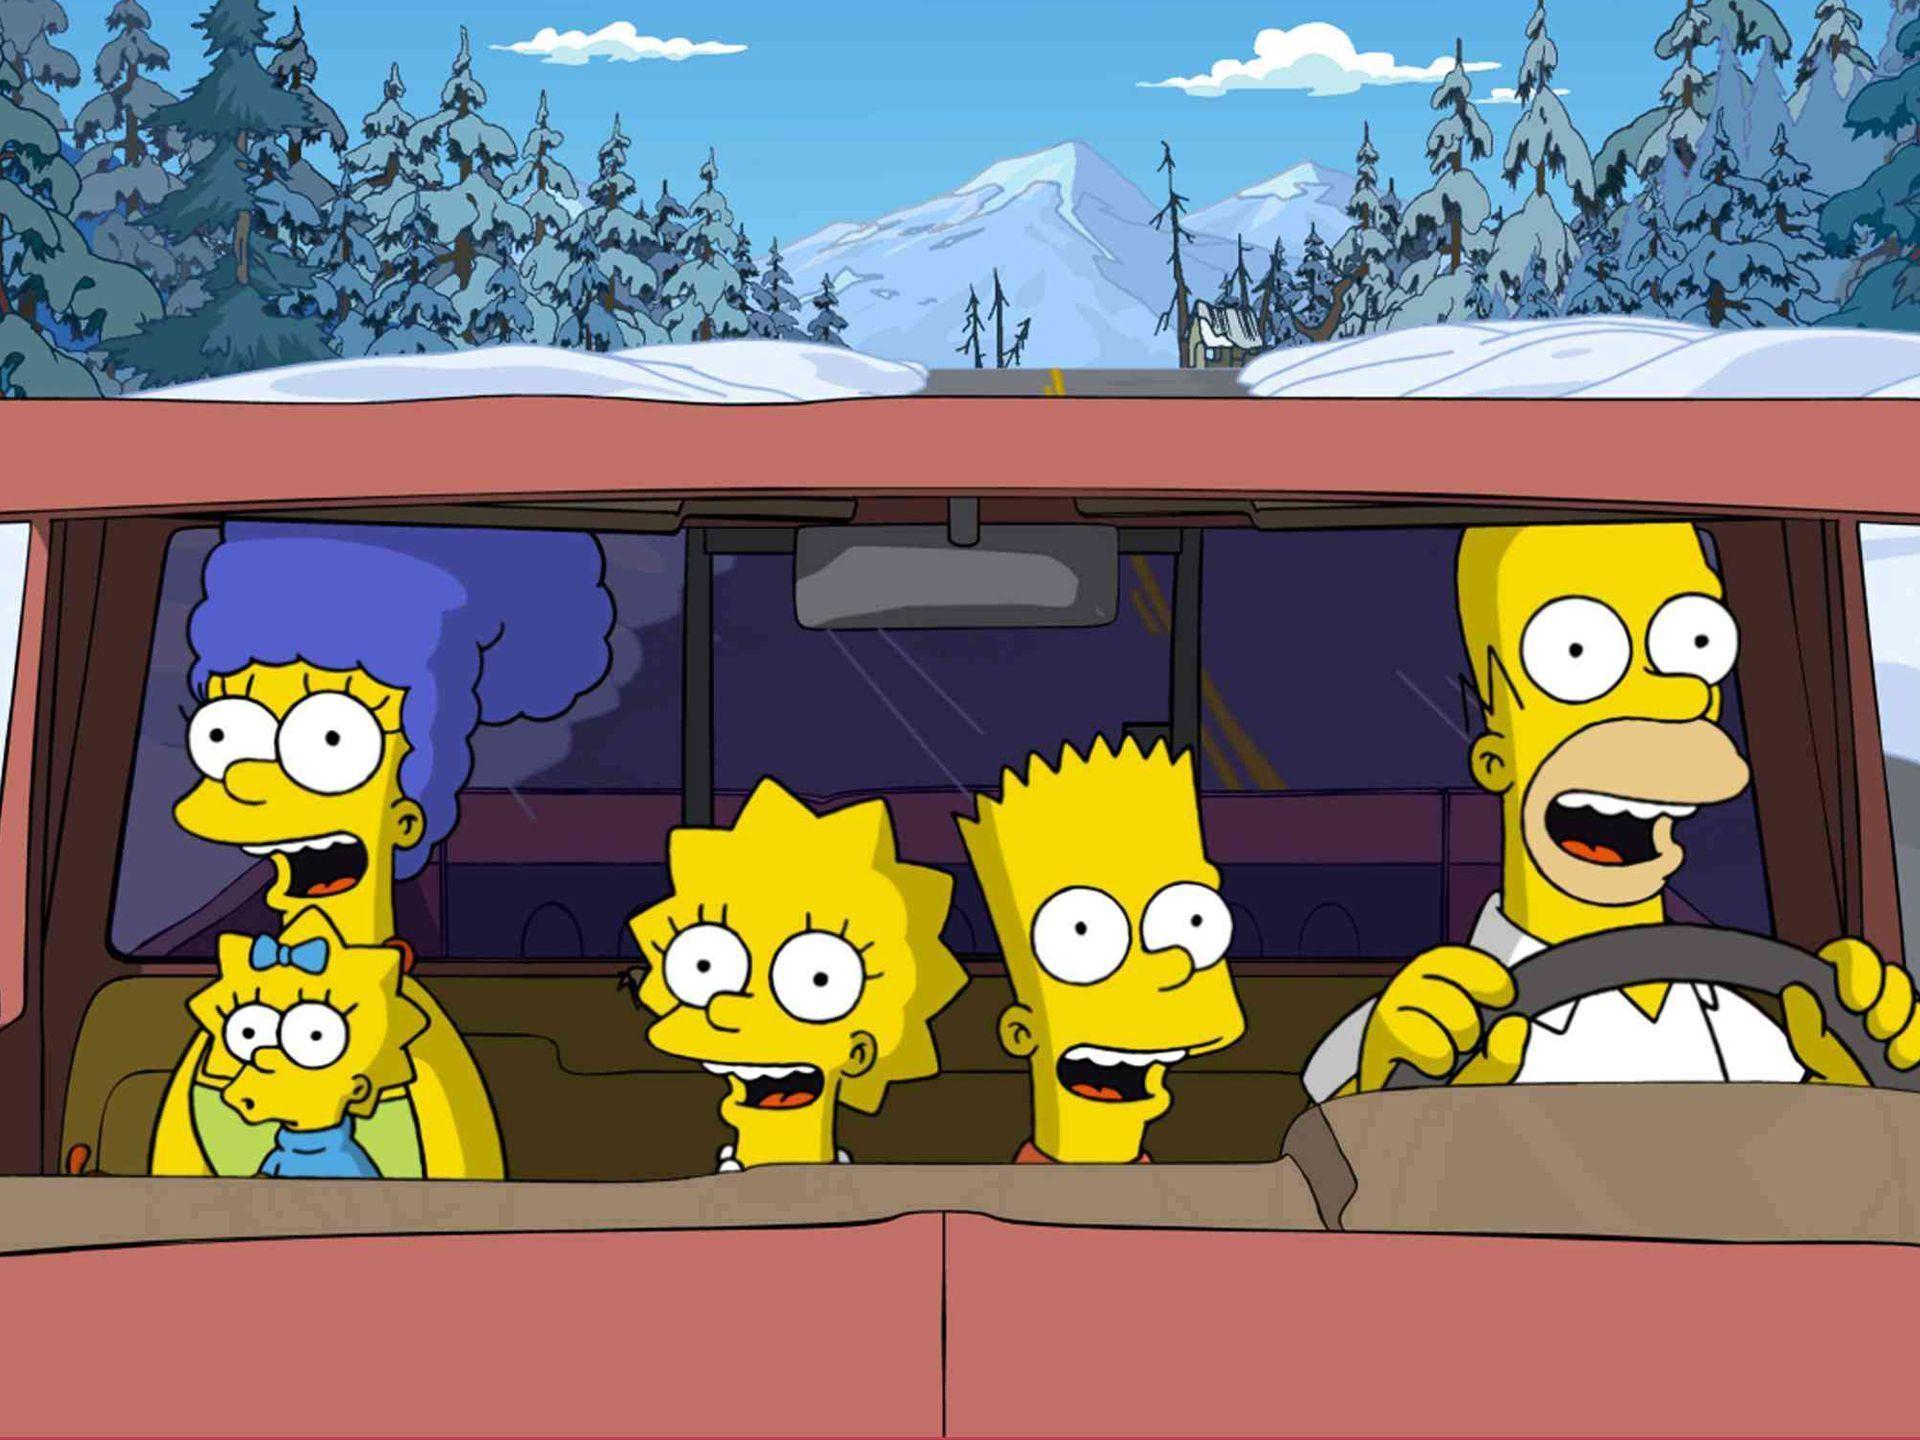 Simpsons Wallpaper For Bedroom Bart Simpson Wallpaper Wallpapers Free Bart Simpson Wallpaper 900